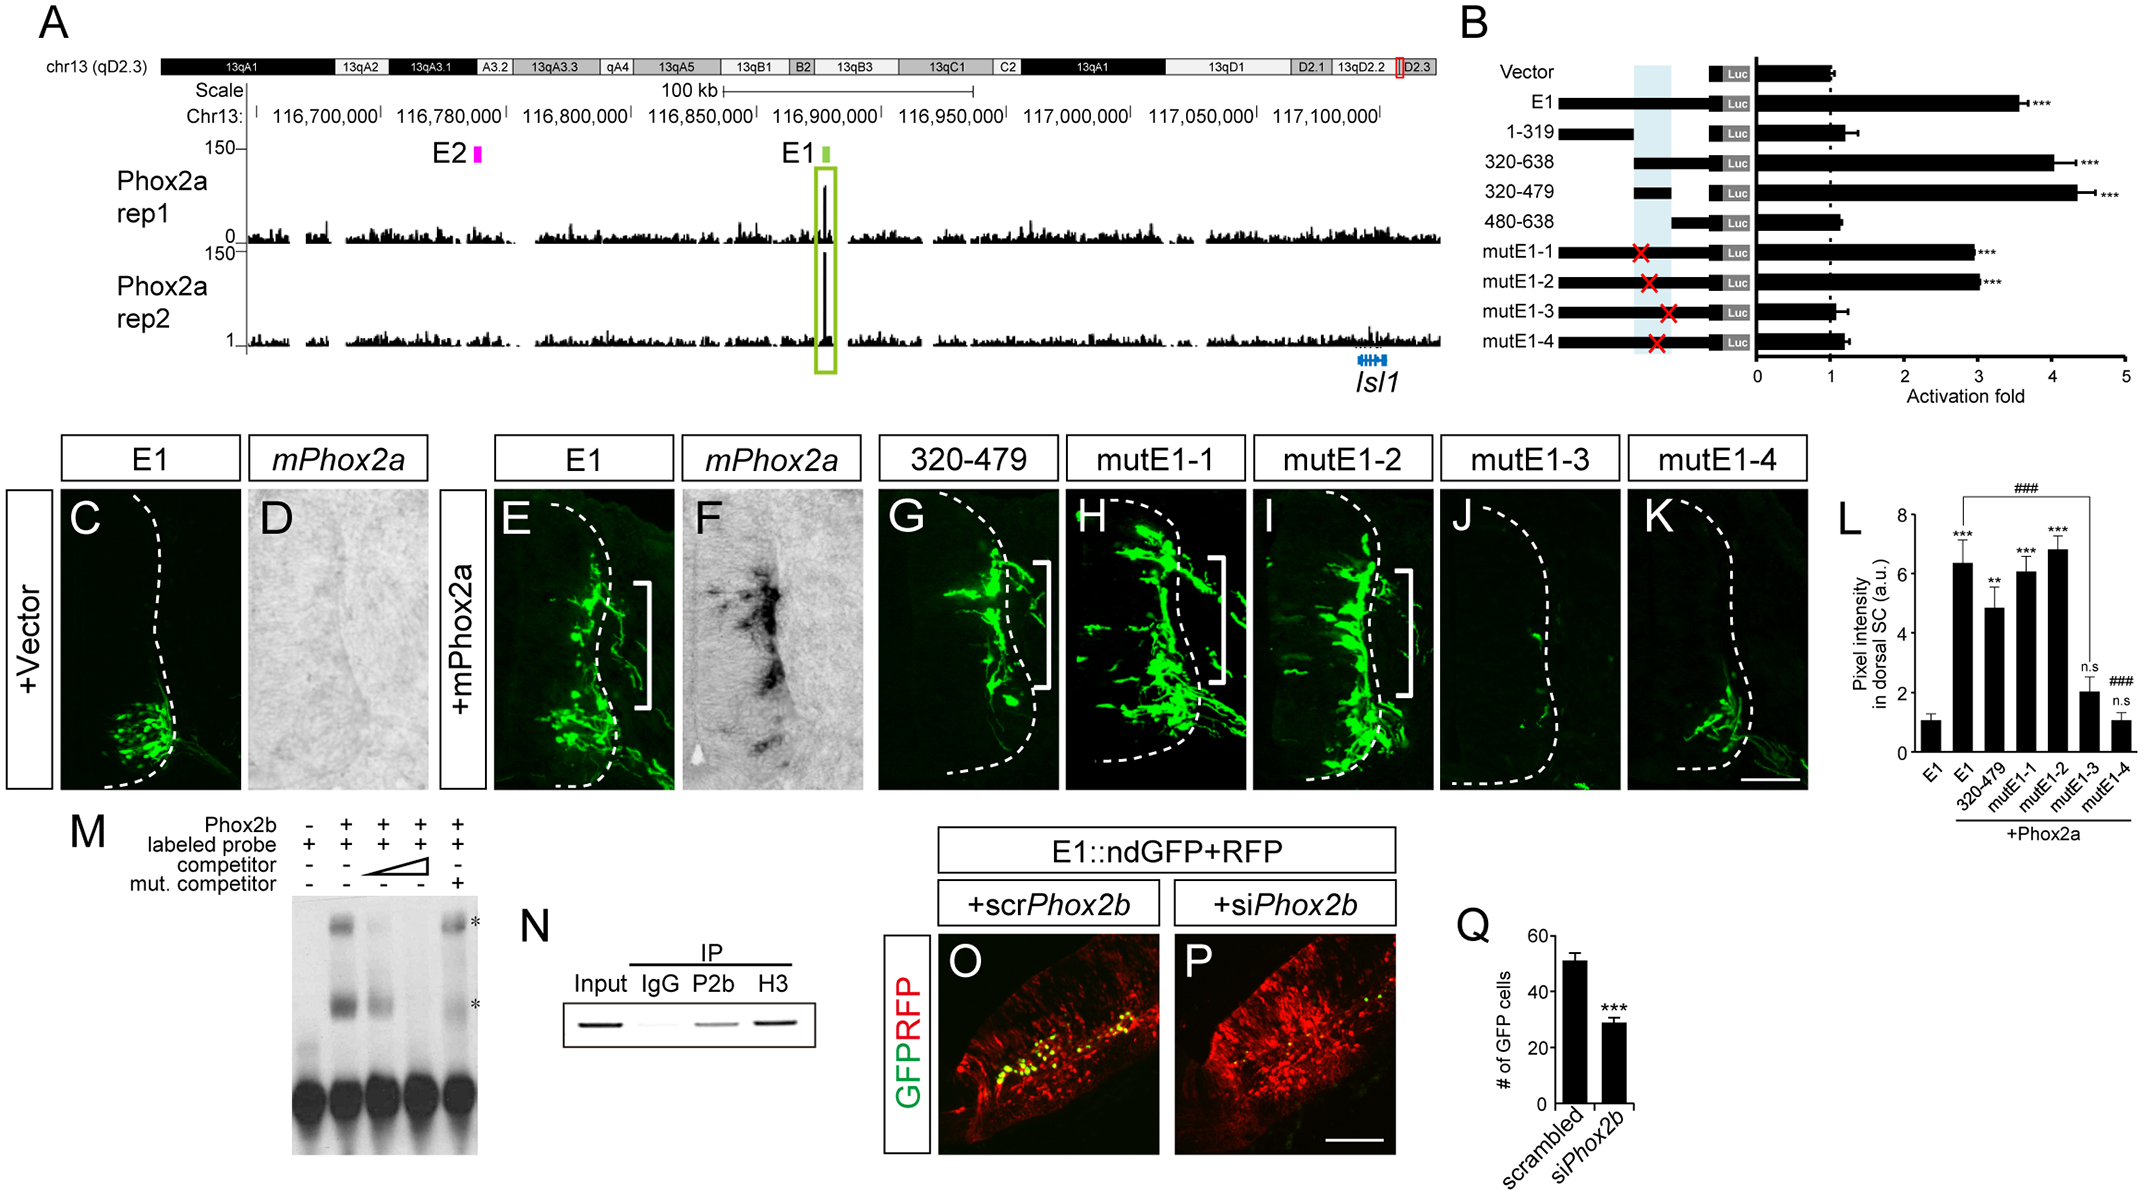 Phox2 regulates Isl1 expression via the E1 enhancer in bm/vm neurons.